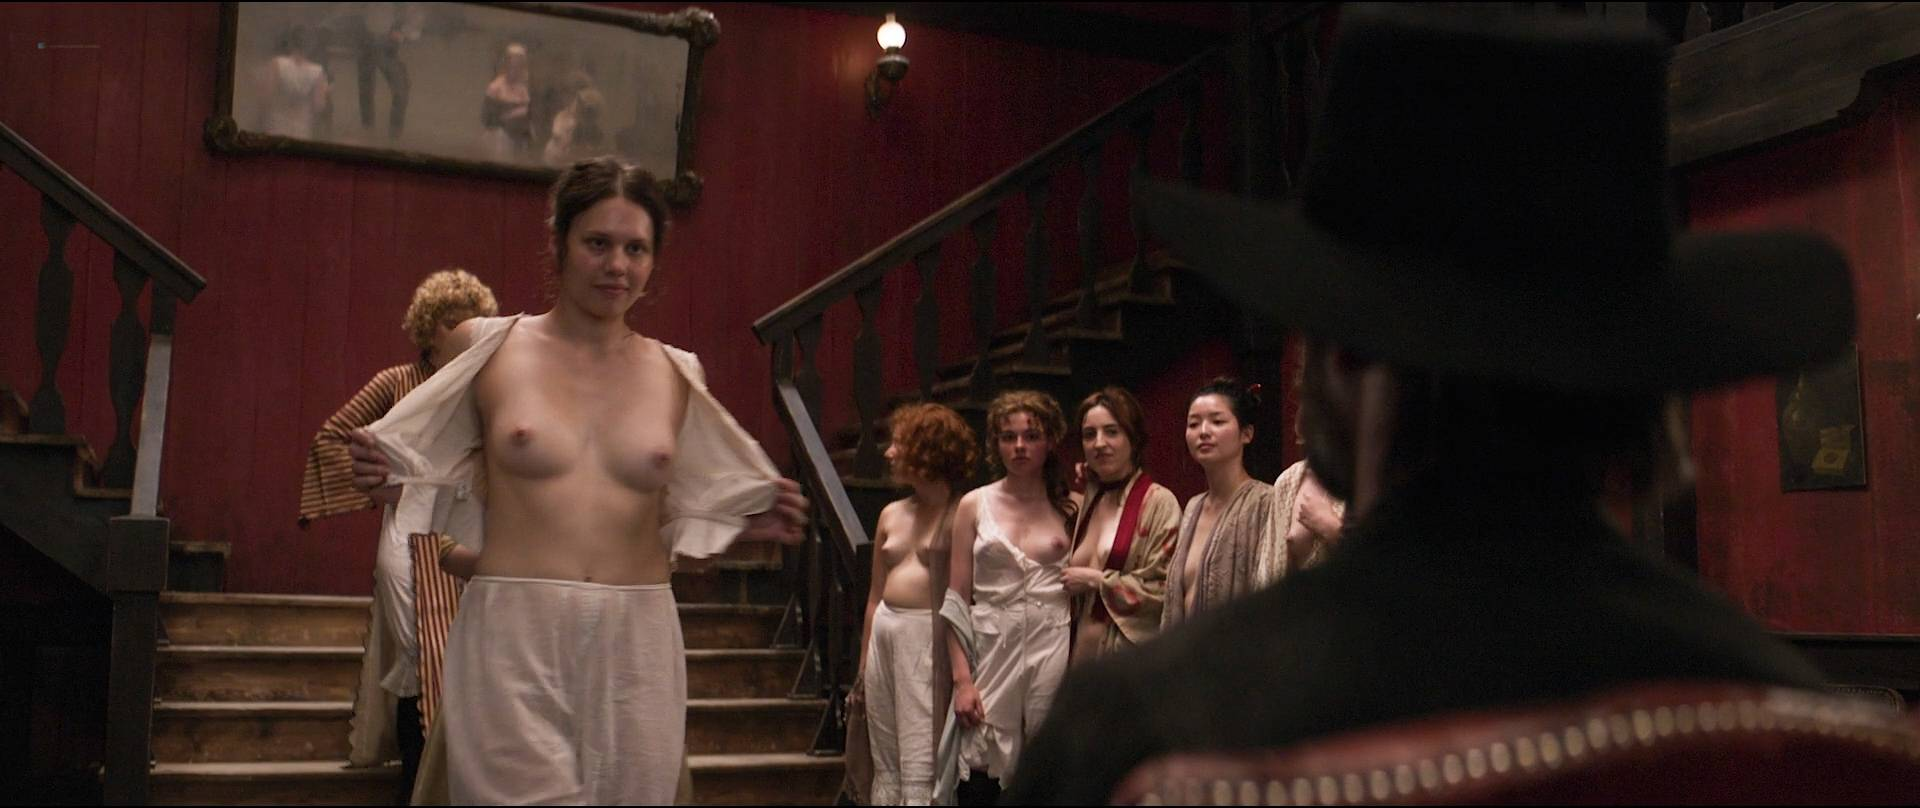 Dakota Fanning hot, Carla Juri, Vera Vitali others nude bush - Brimstone (2016) HD 1080p BluRay (11)